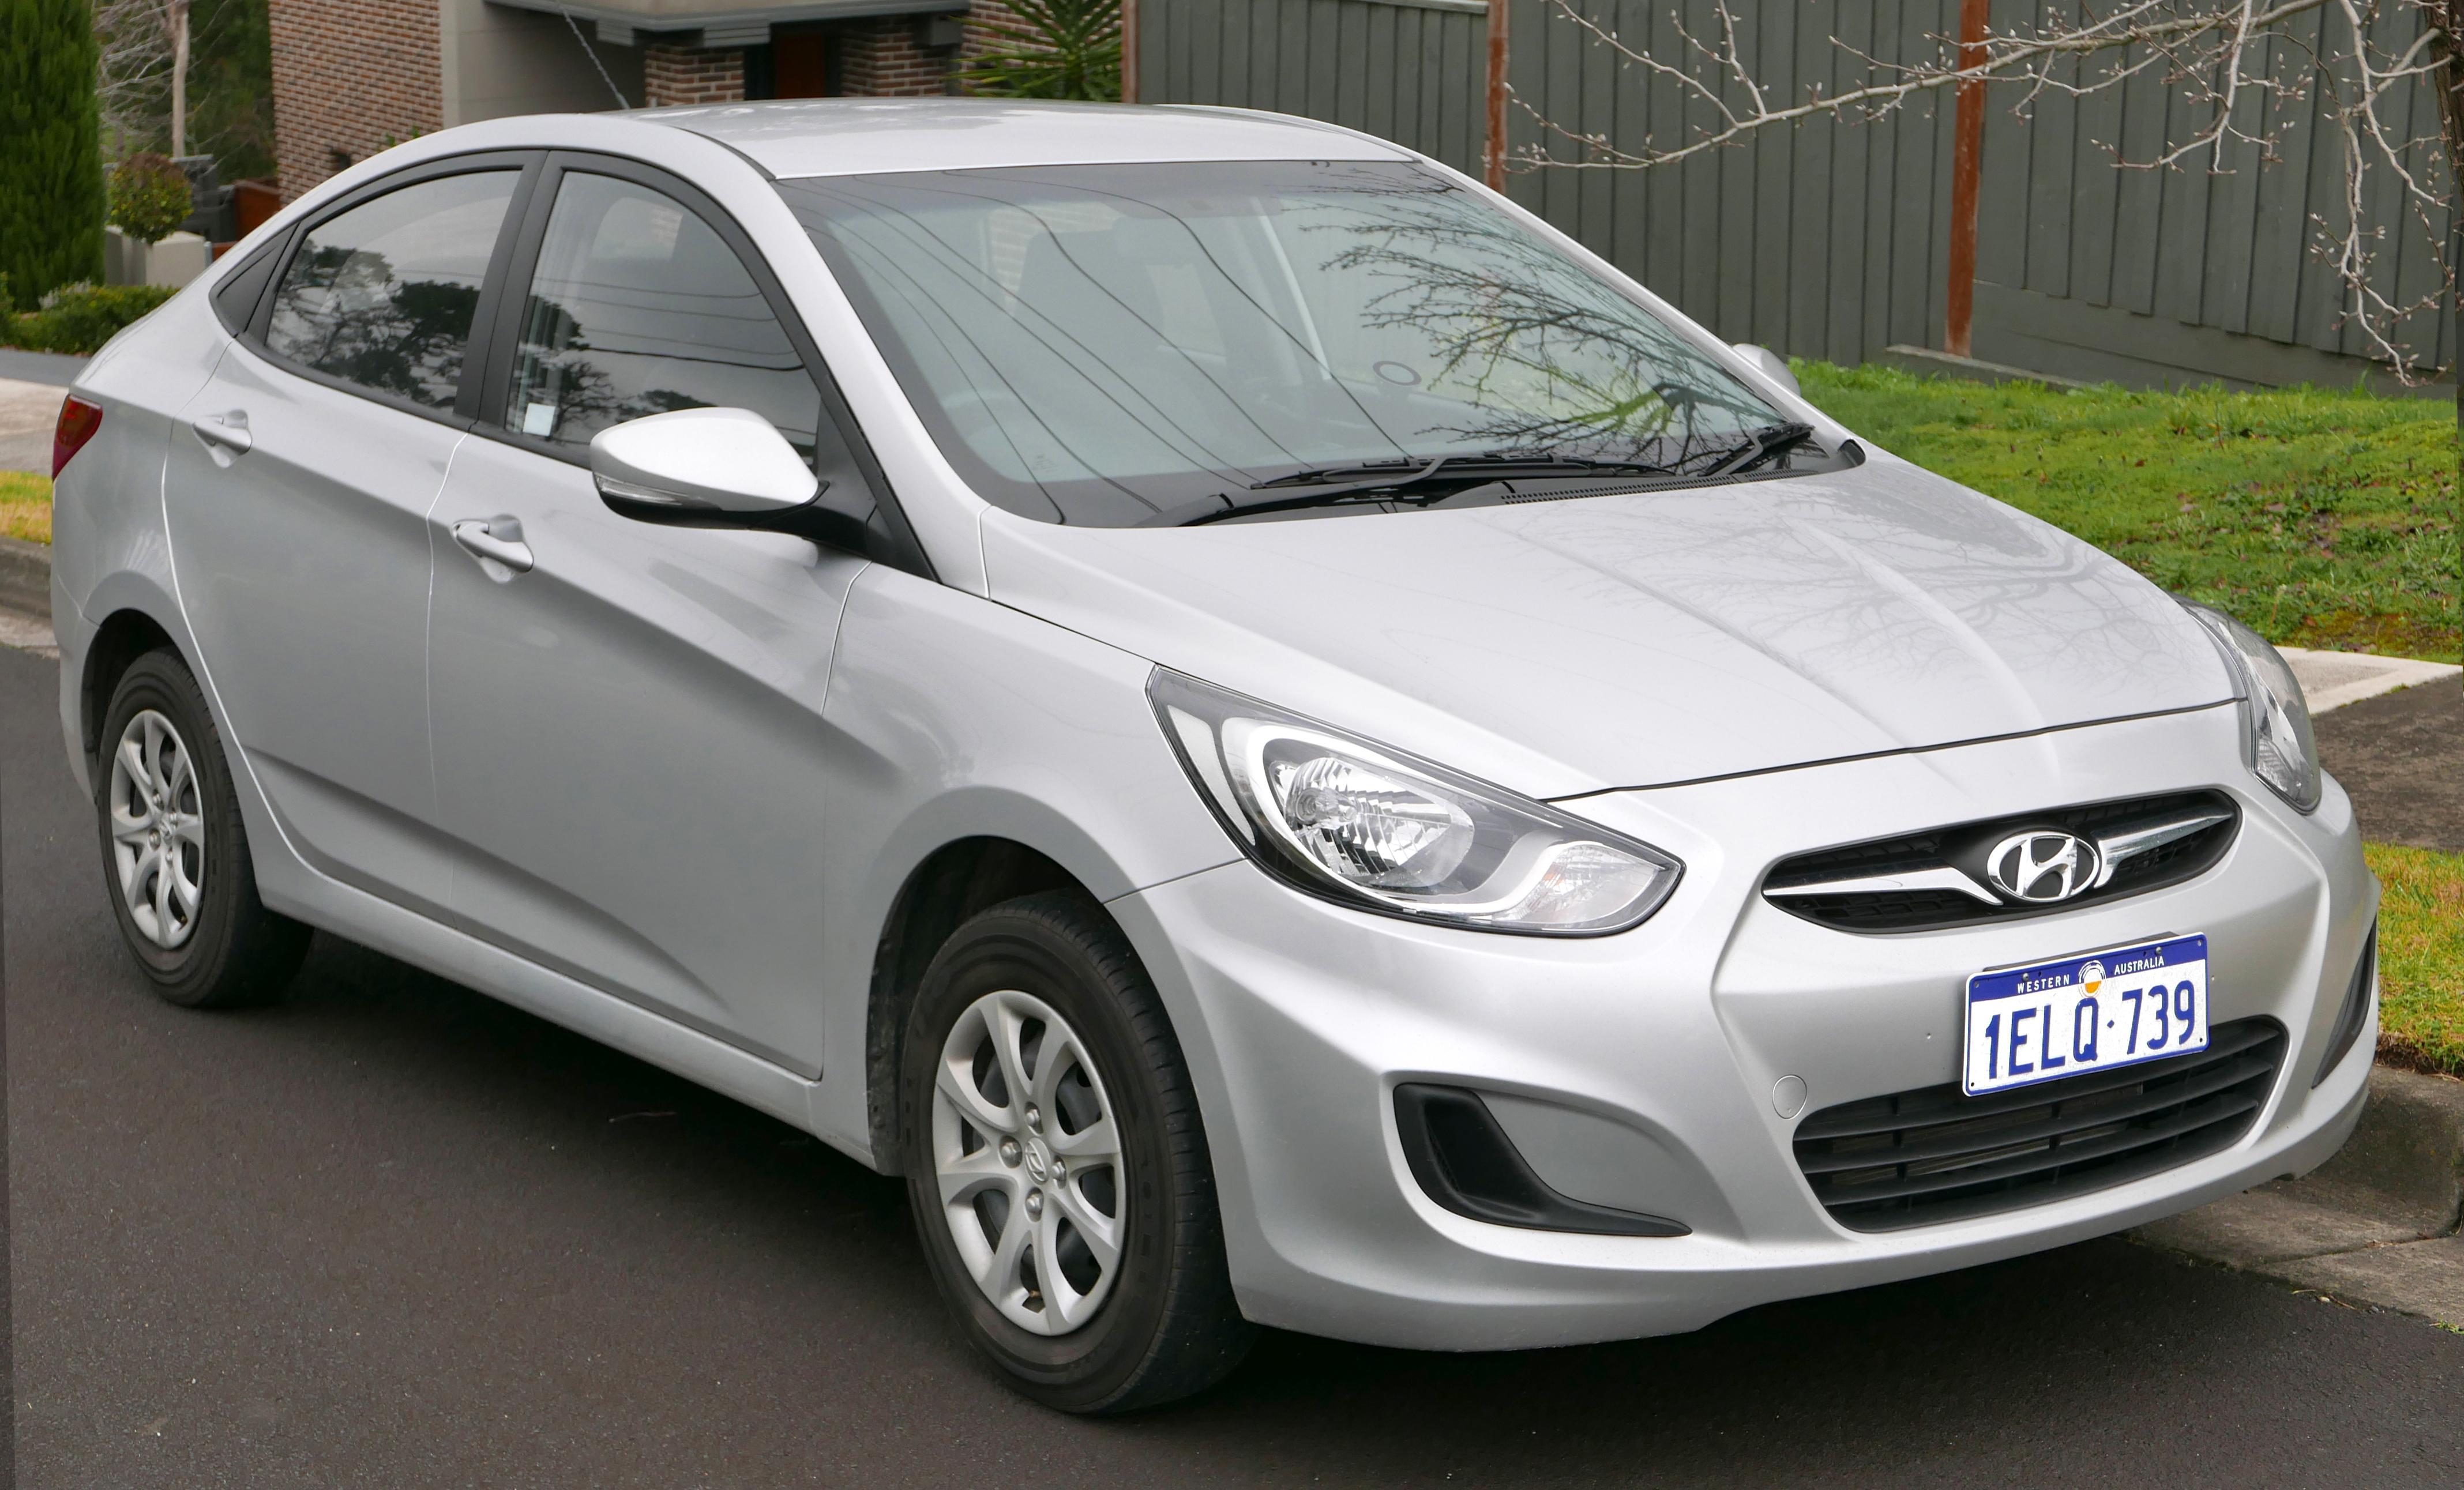 Hyundai Accent Wikiwand